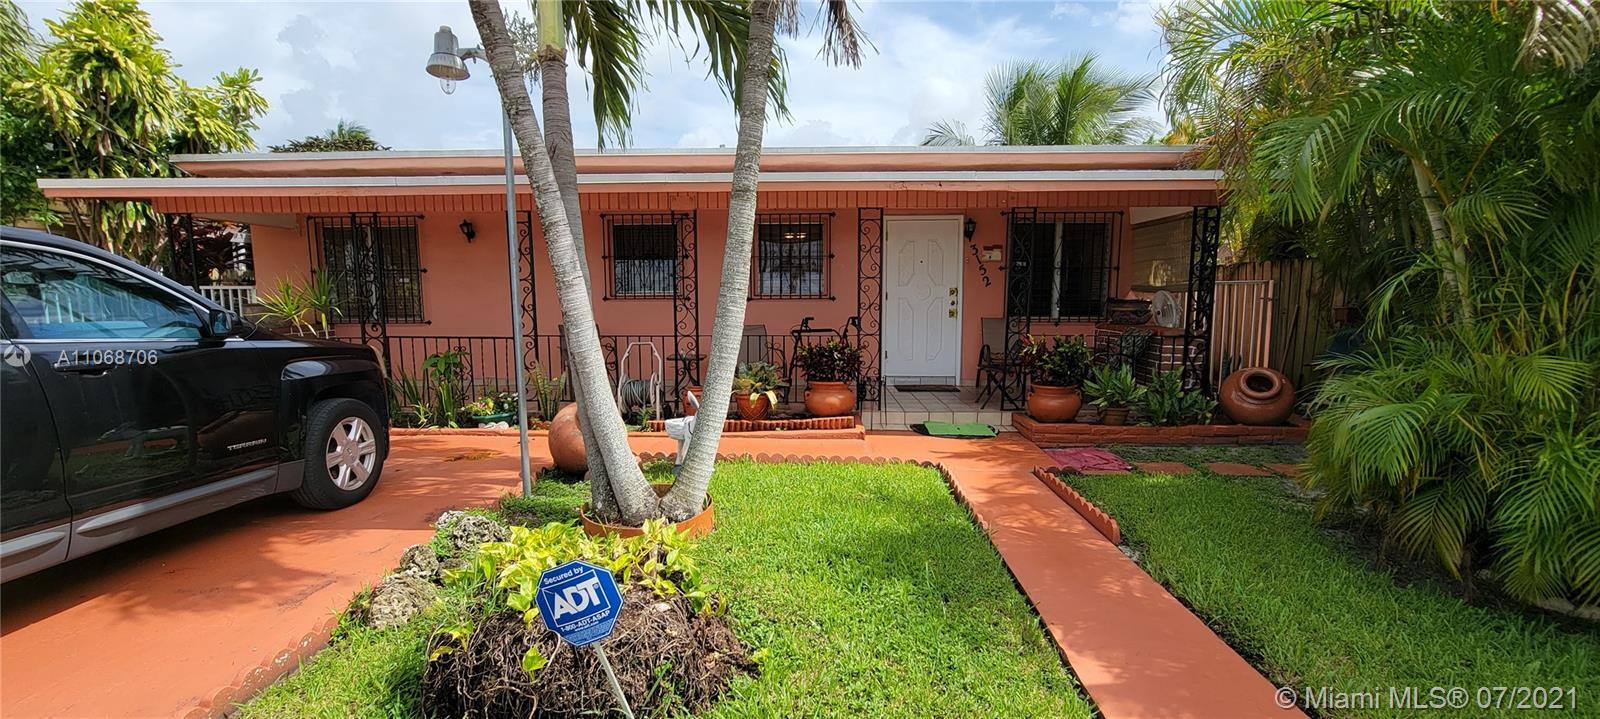 3152 35th St, Miami, Florida 33142